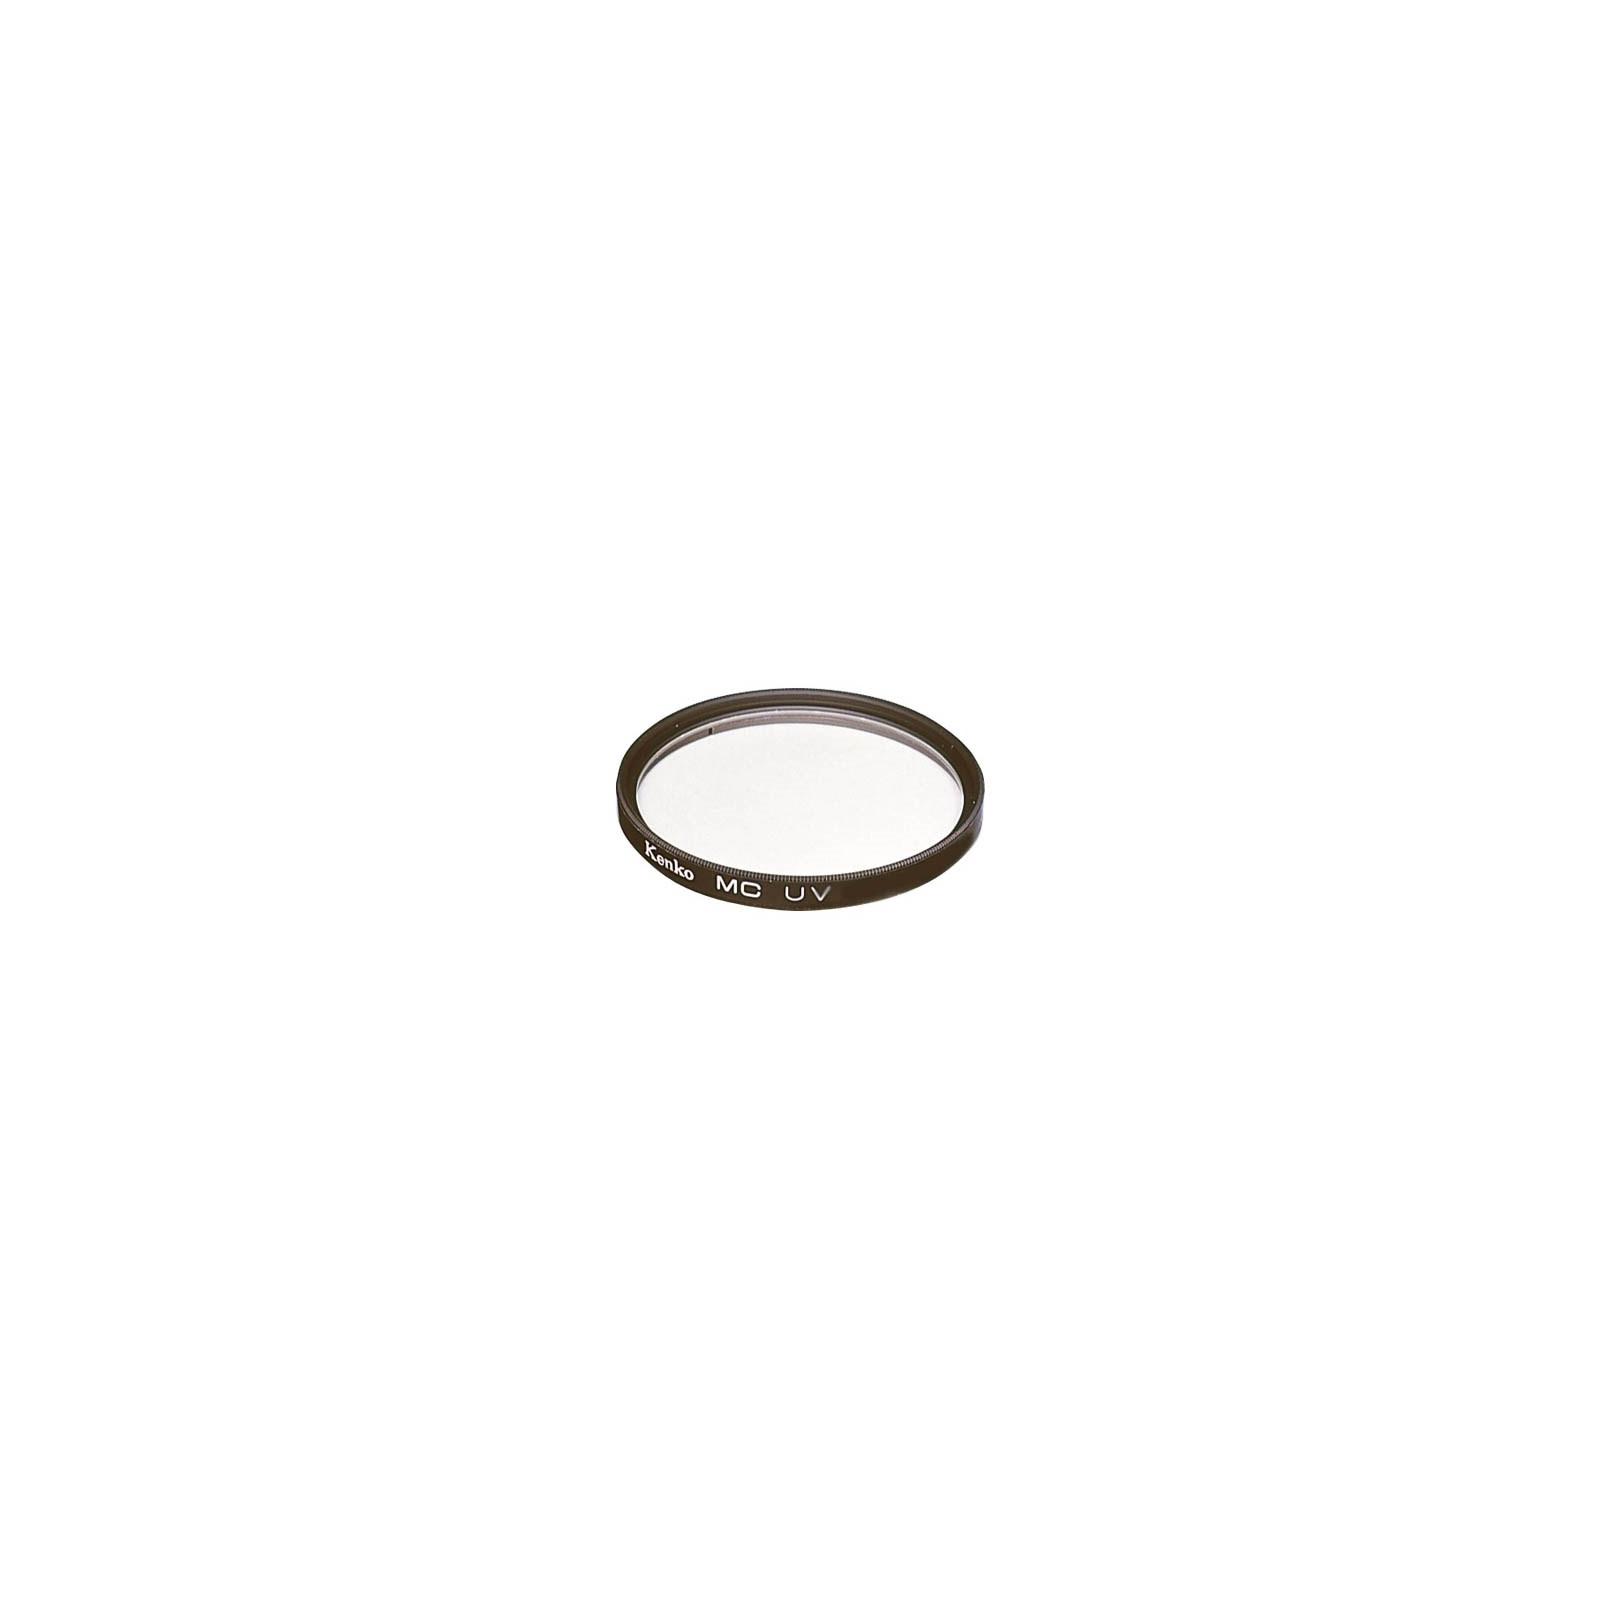 Светофильтр Kenko MC UV 52mm (215291)